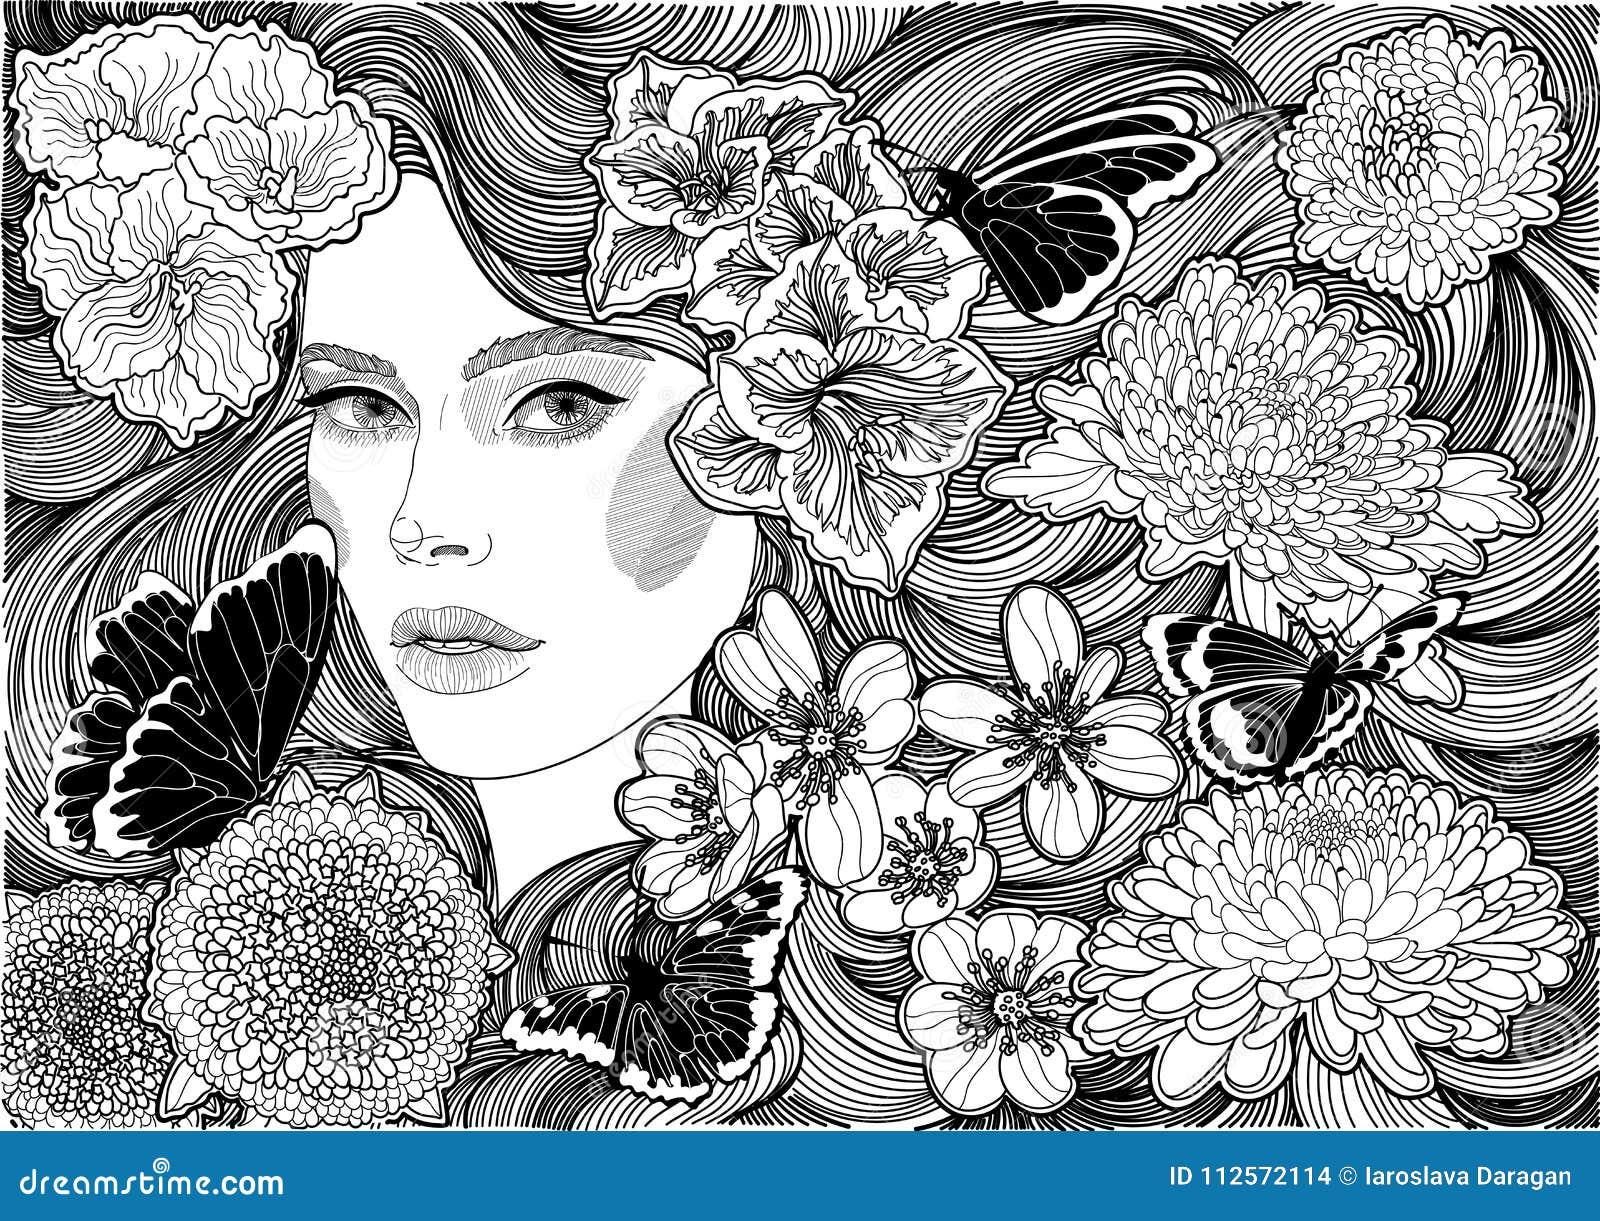 Menina e flores e borboletas preto e branco